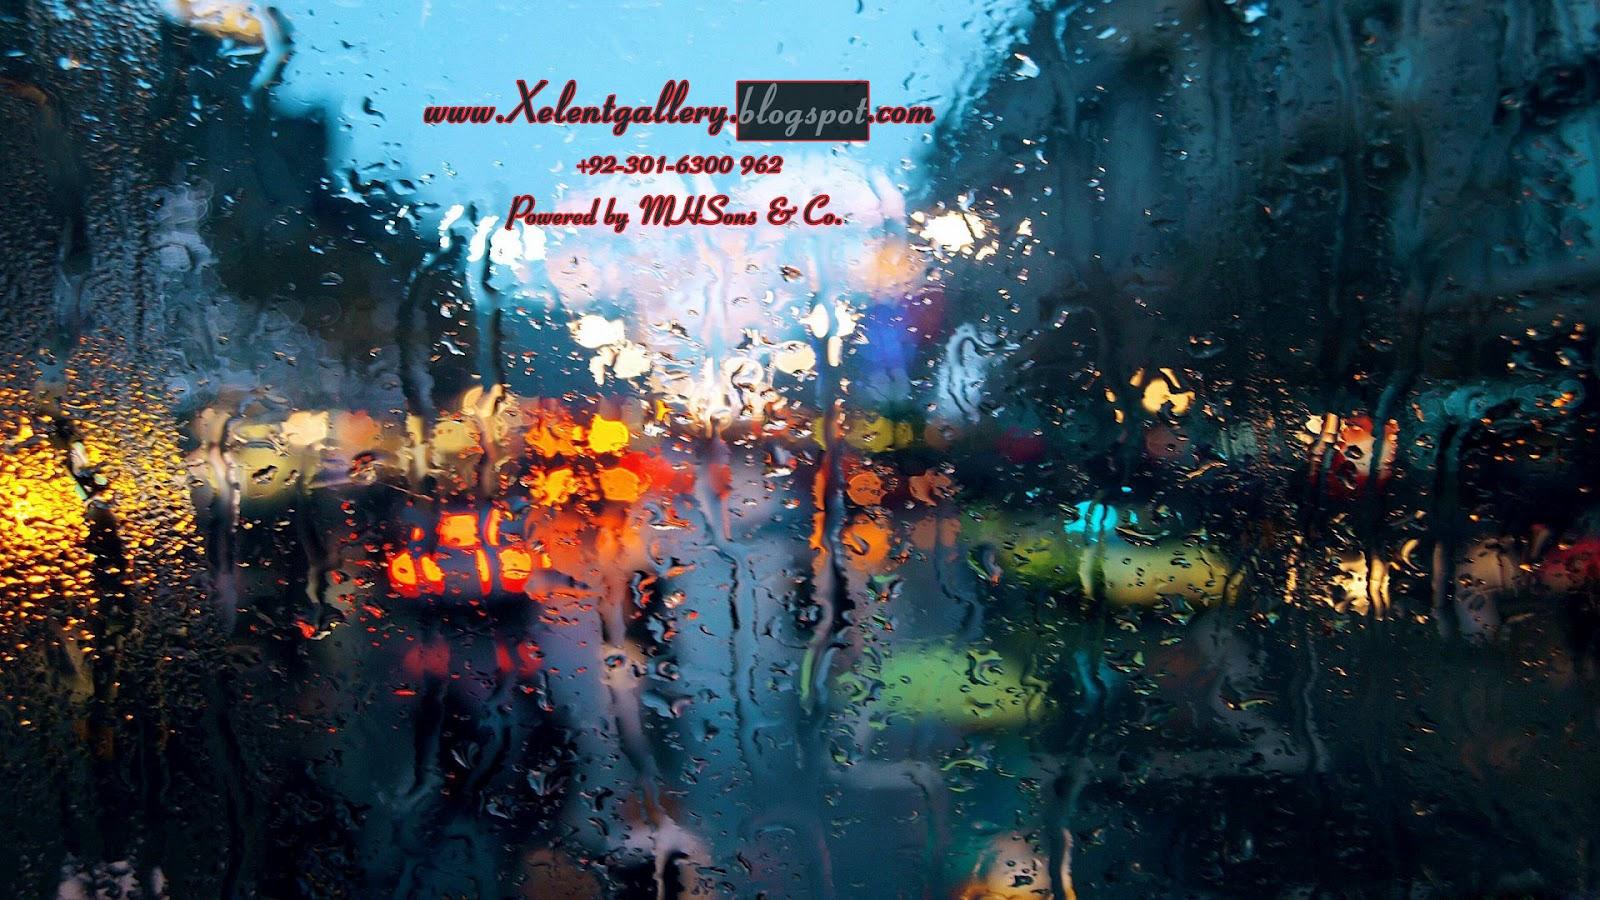 http://3.bp.blogspot.com/-Cy8LMaEwsTY/T8TfpQQxIZI/AAAAAAAAAG8/IOakfj6BtOY/s1600/Rainy+Wallpapers+%252816%2529.jpg